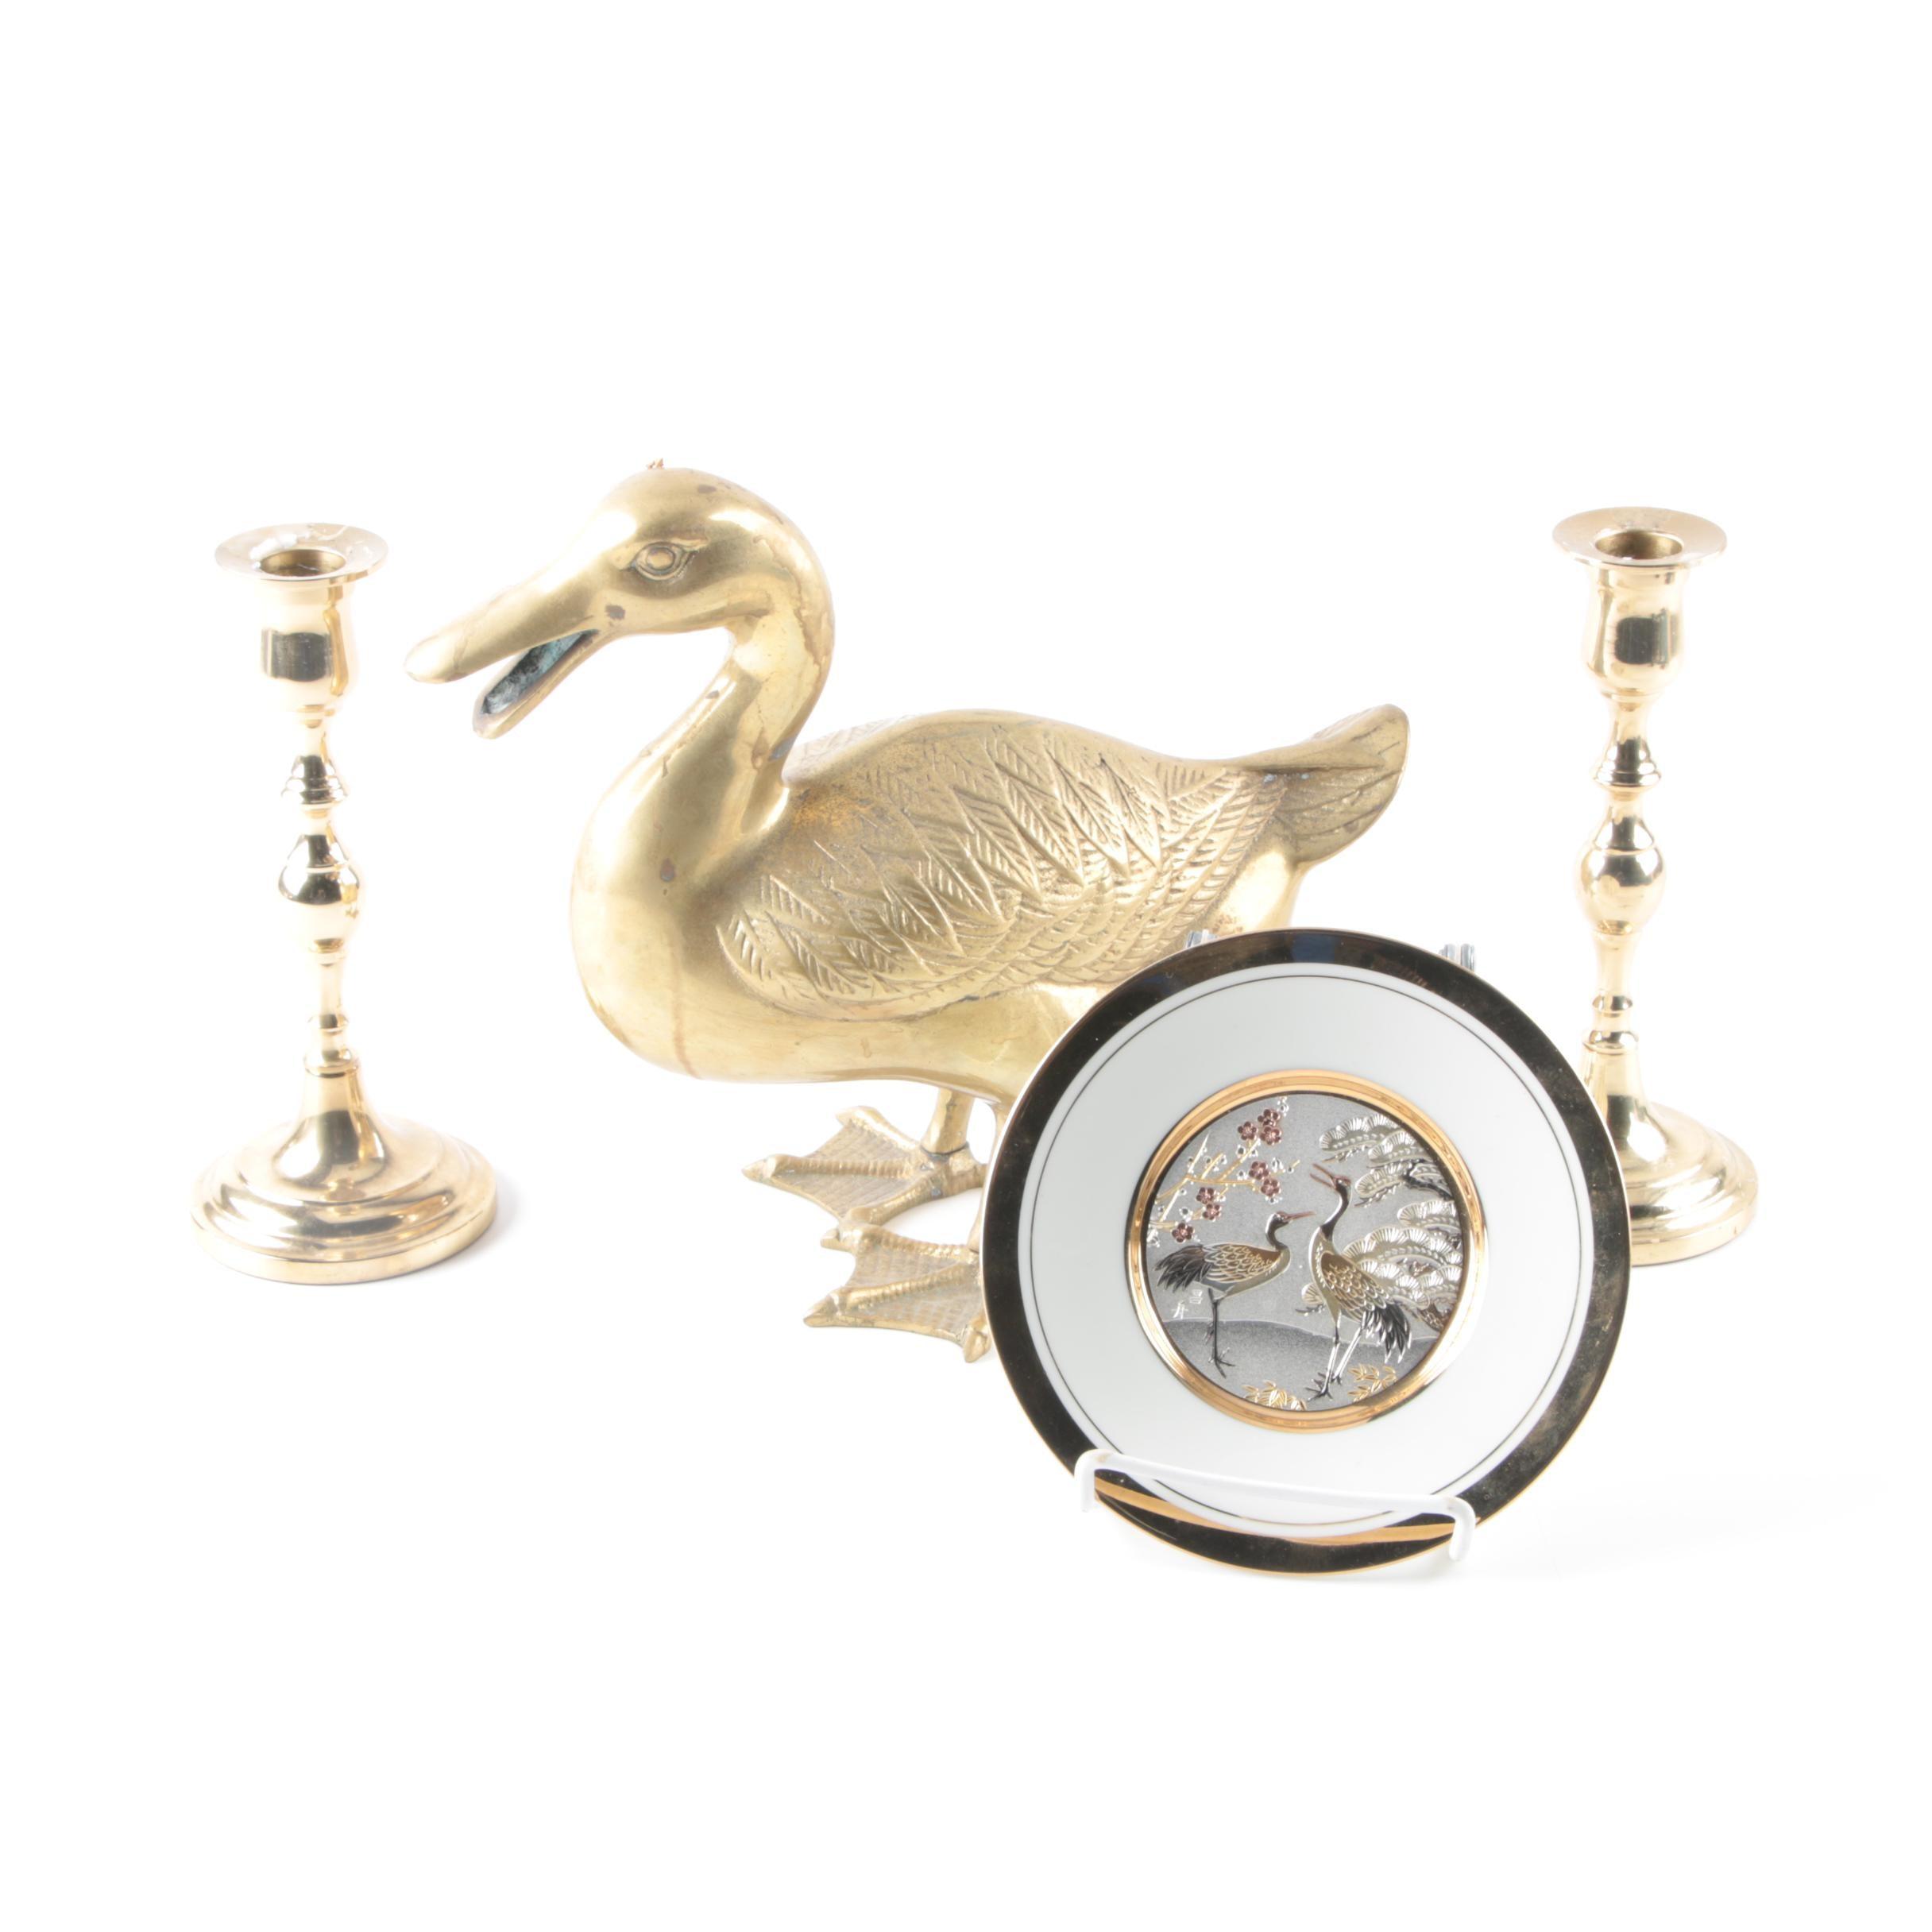 Chokin Plate and Brass Decorative Pieces